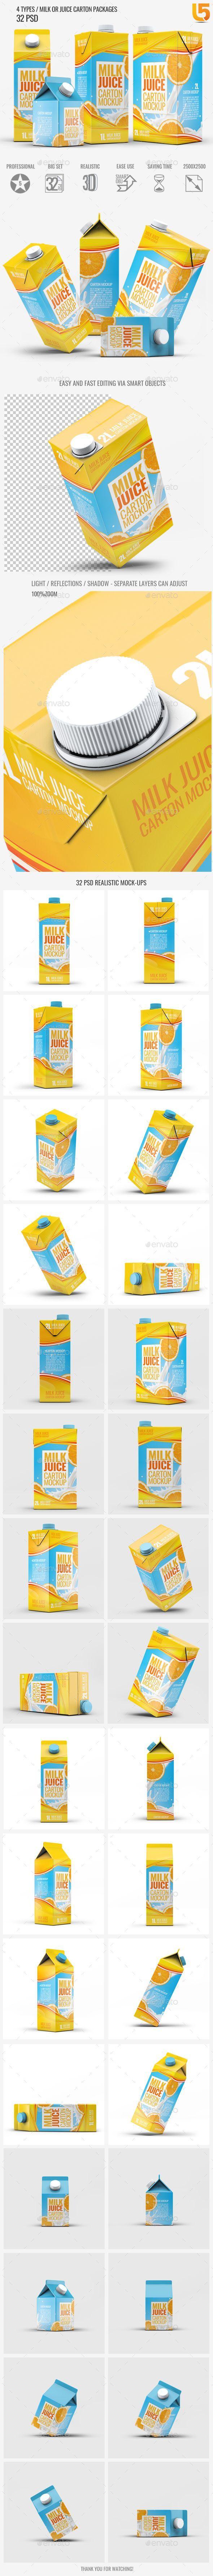 4 Types Milk / Juice Cartons Bundle Mock-Up PSD. Download here: ... -